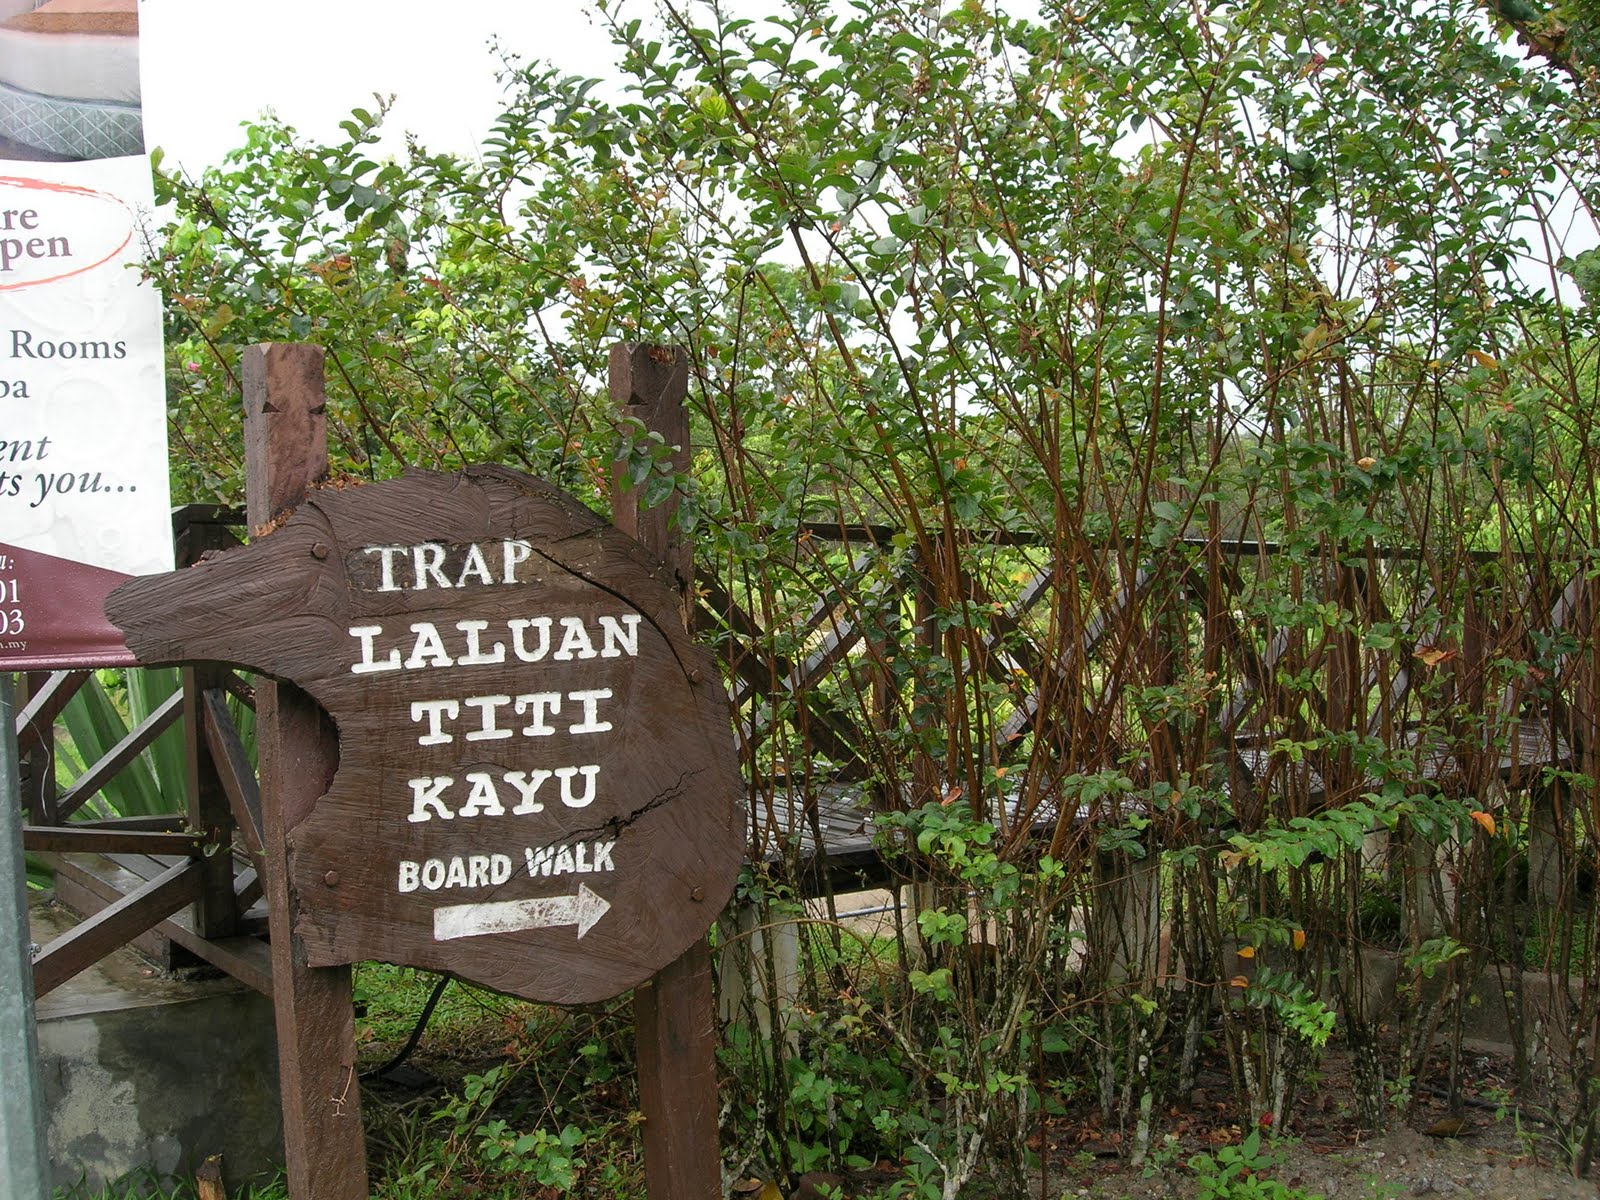 Sungai klah hot springs - Take A Healthy Morning Stroll On The Boardwalk